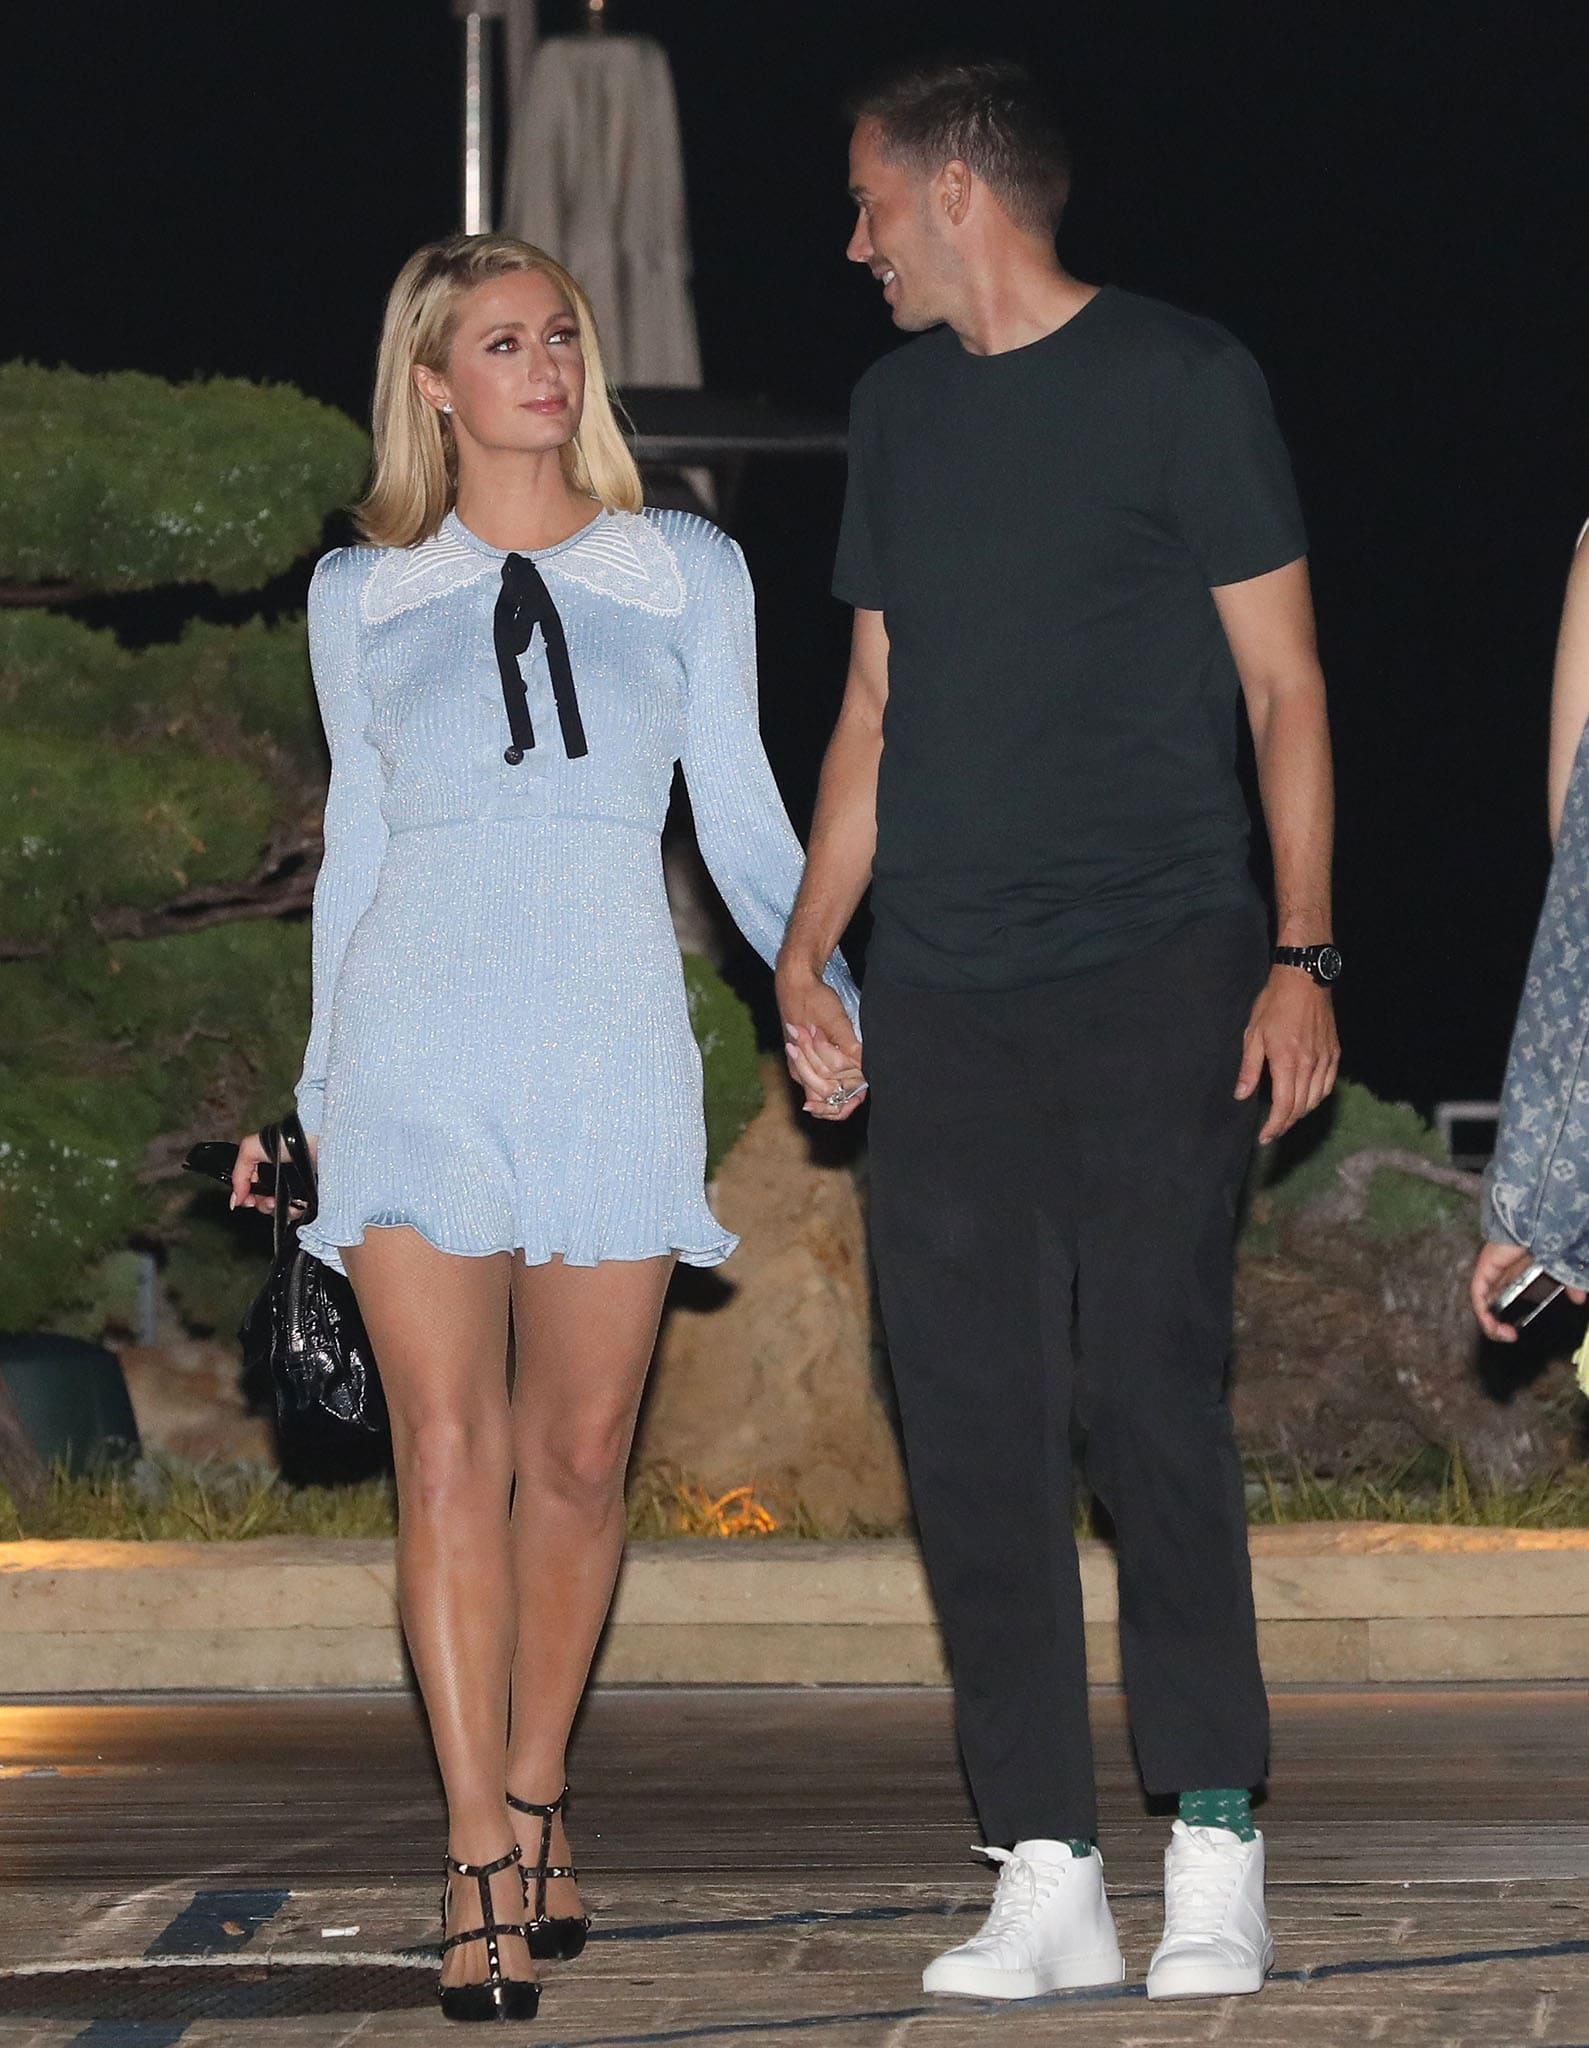 Paris Hilton and fiancé Carter Reum walk hand-in-hand while leaving Nobu Malibu on July 4, 2021